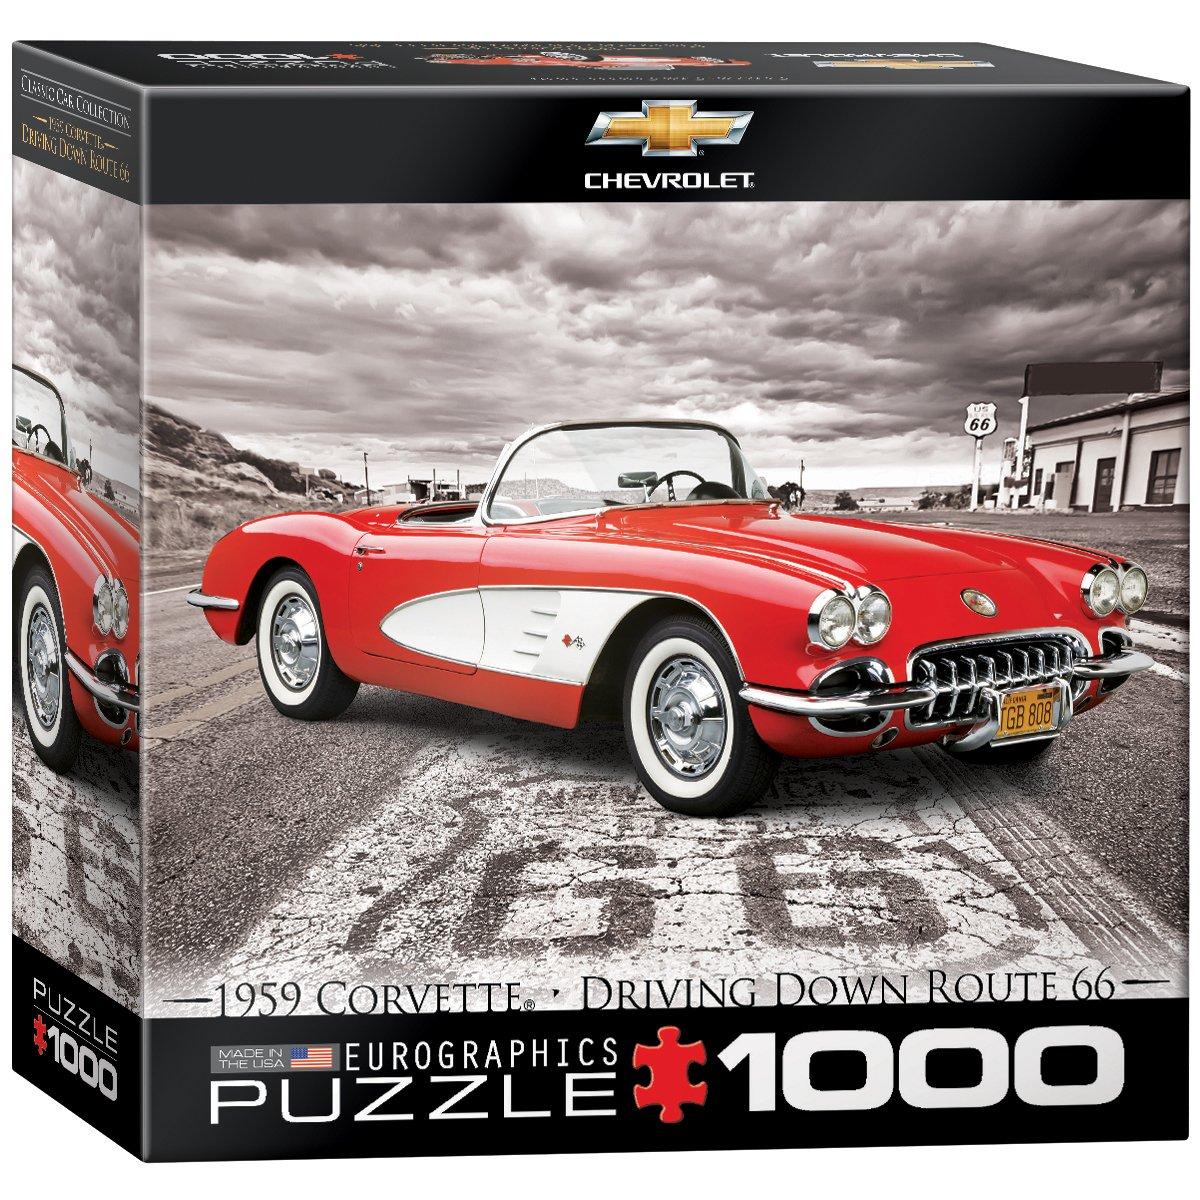 Eurographics Toys 8000-0665 1000-Piece EuroGraphics 1959 Corvette Jigsaw Puzzle Small Box